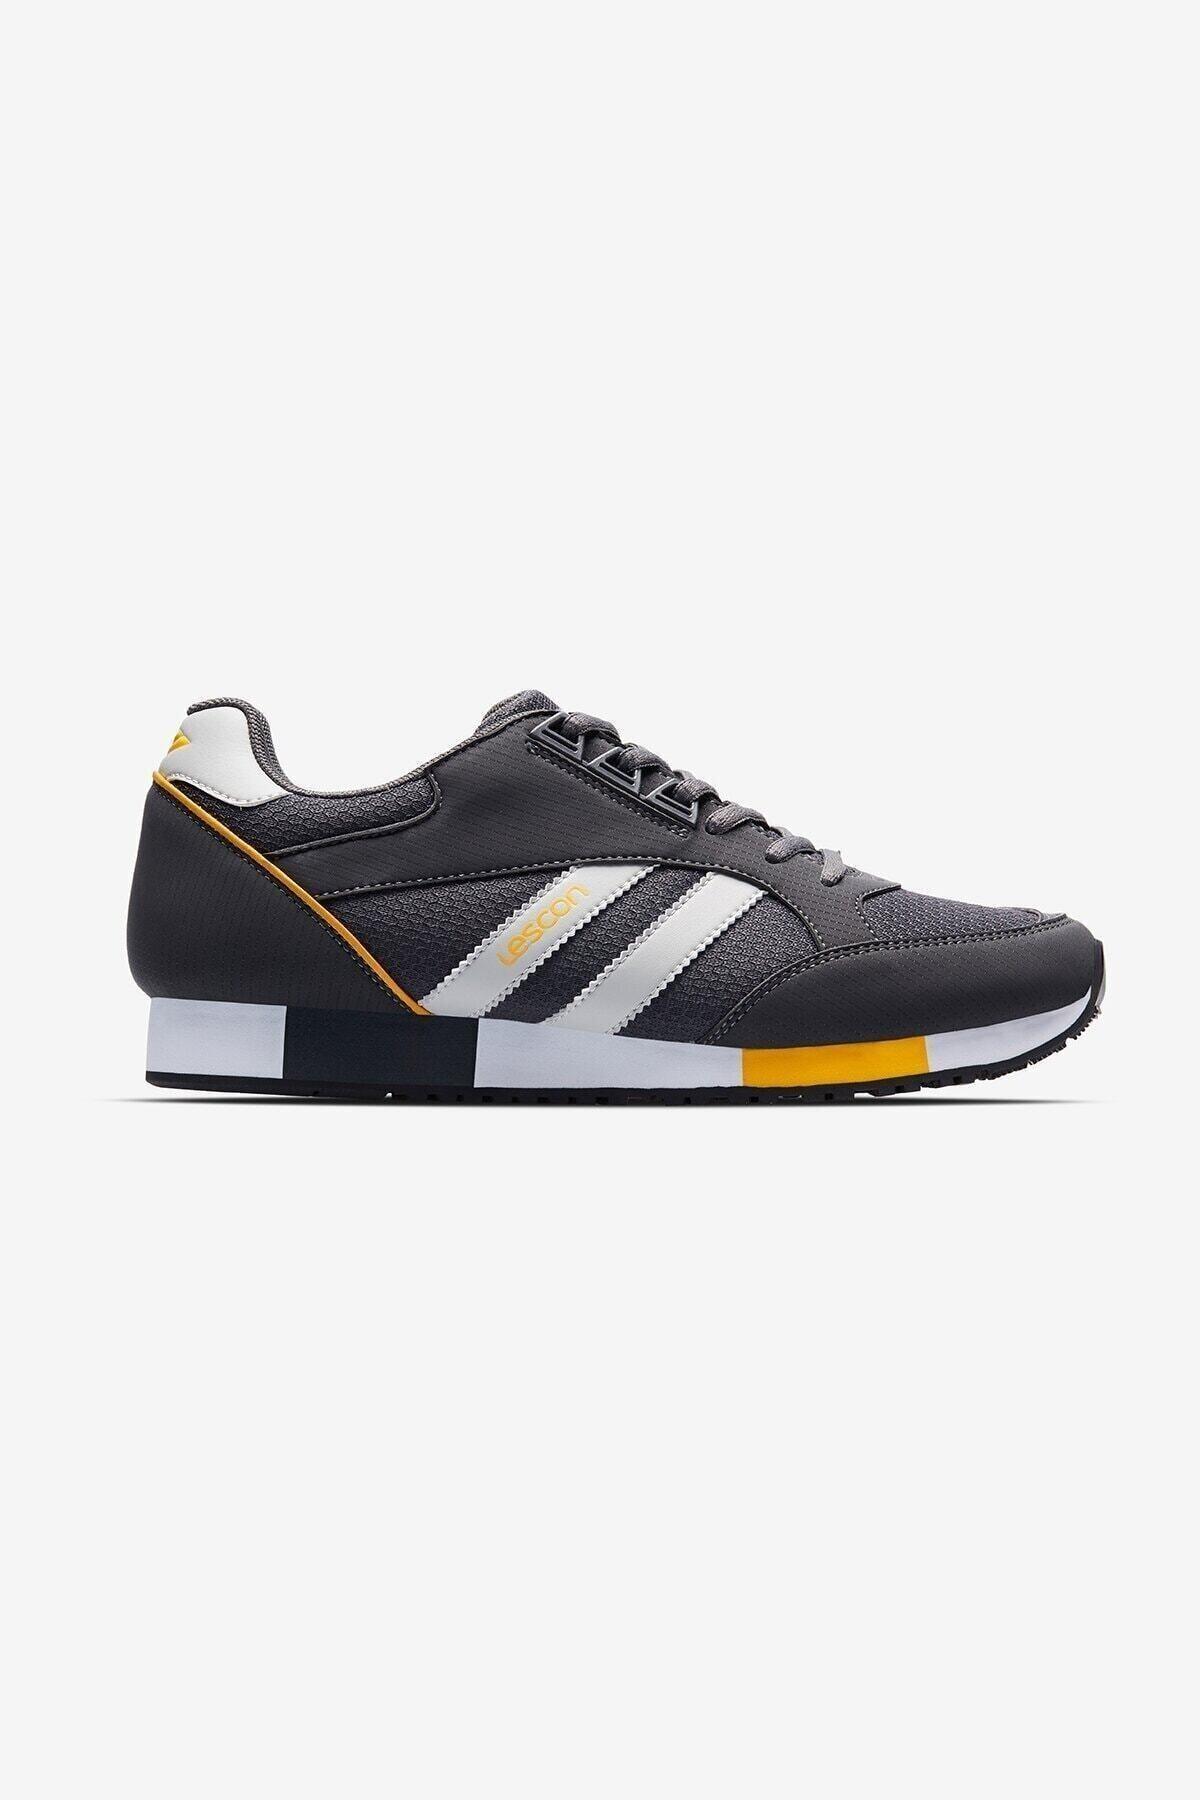 Lescon Sneaker Ayakkabı 21bae00snbom276 Boston-2 1